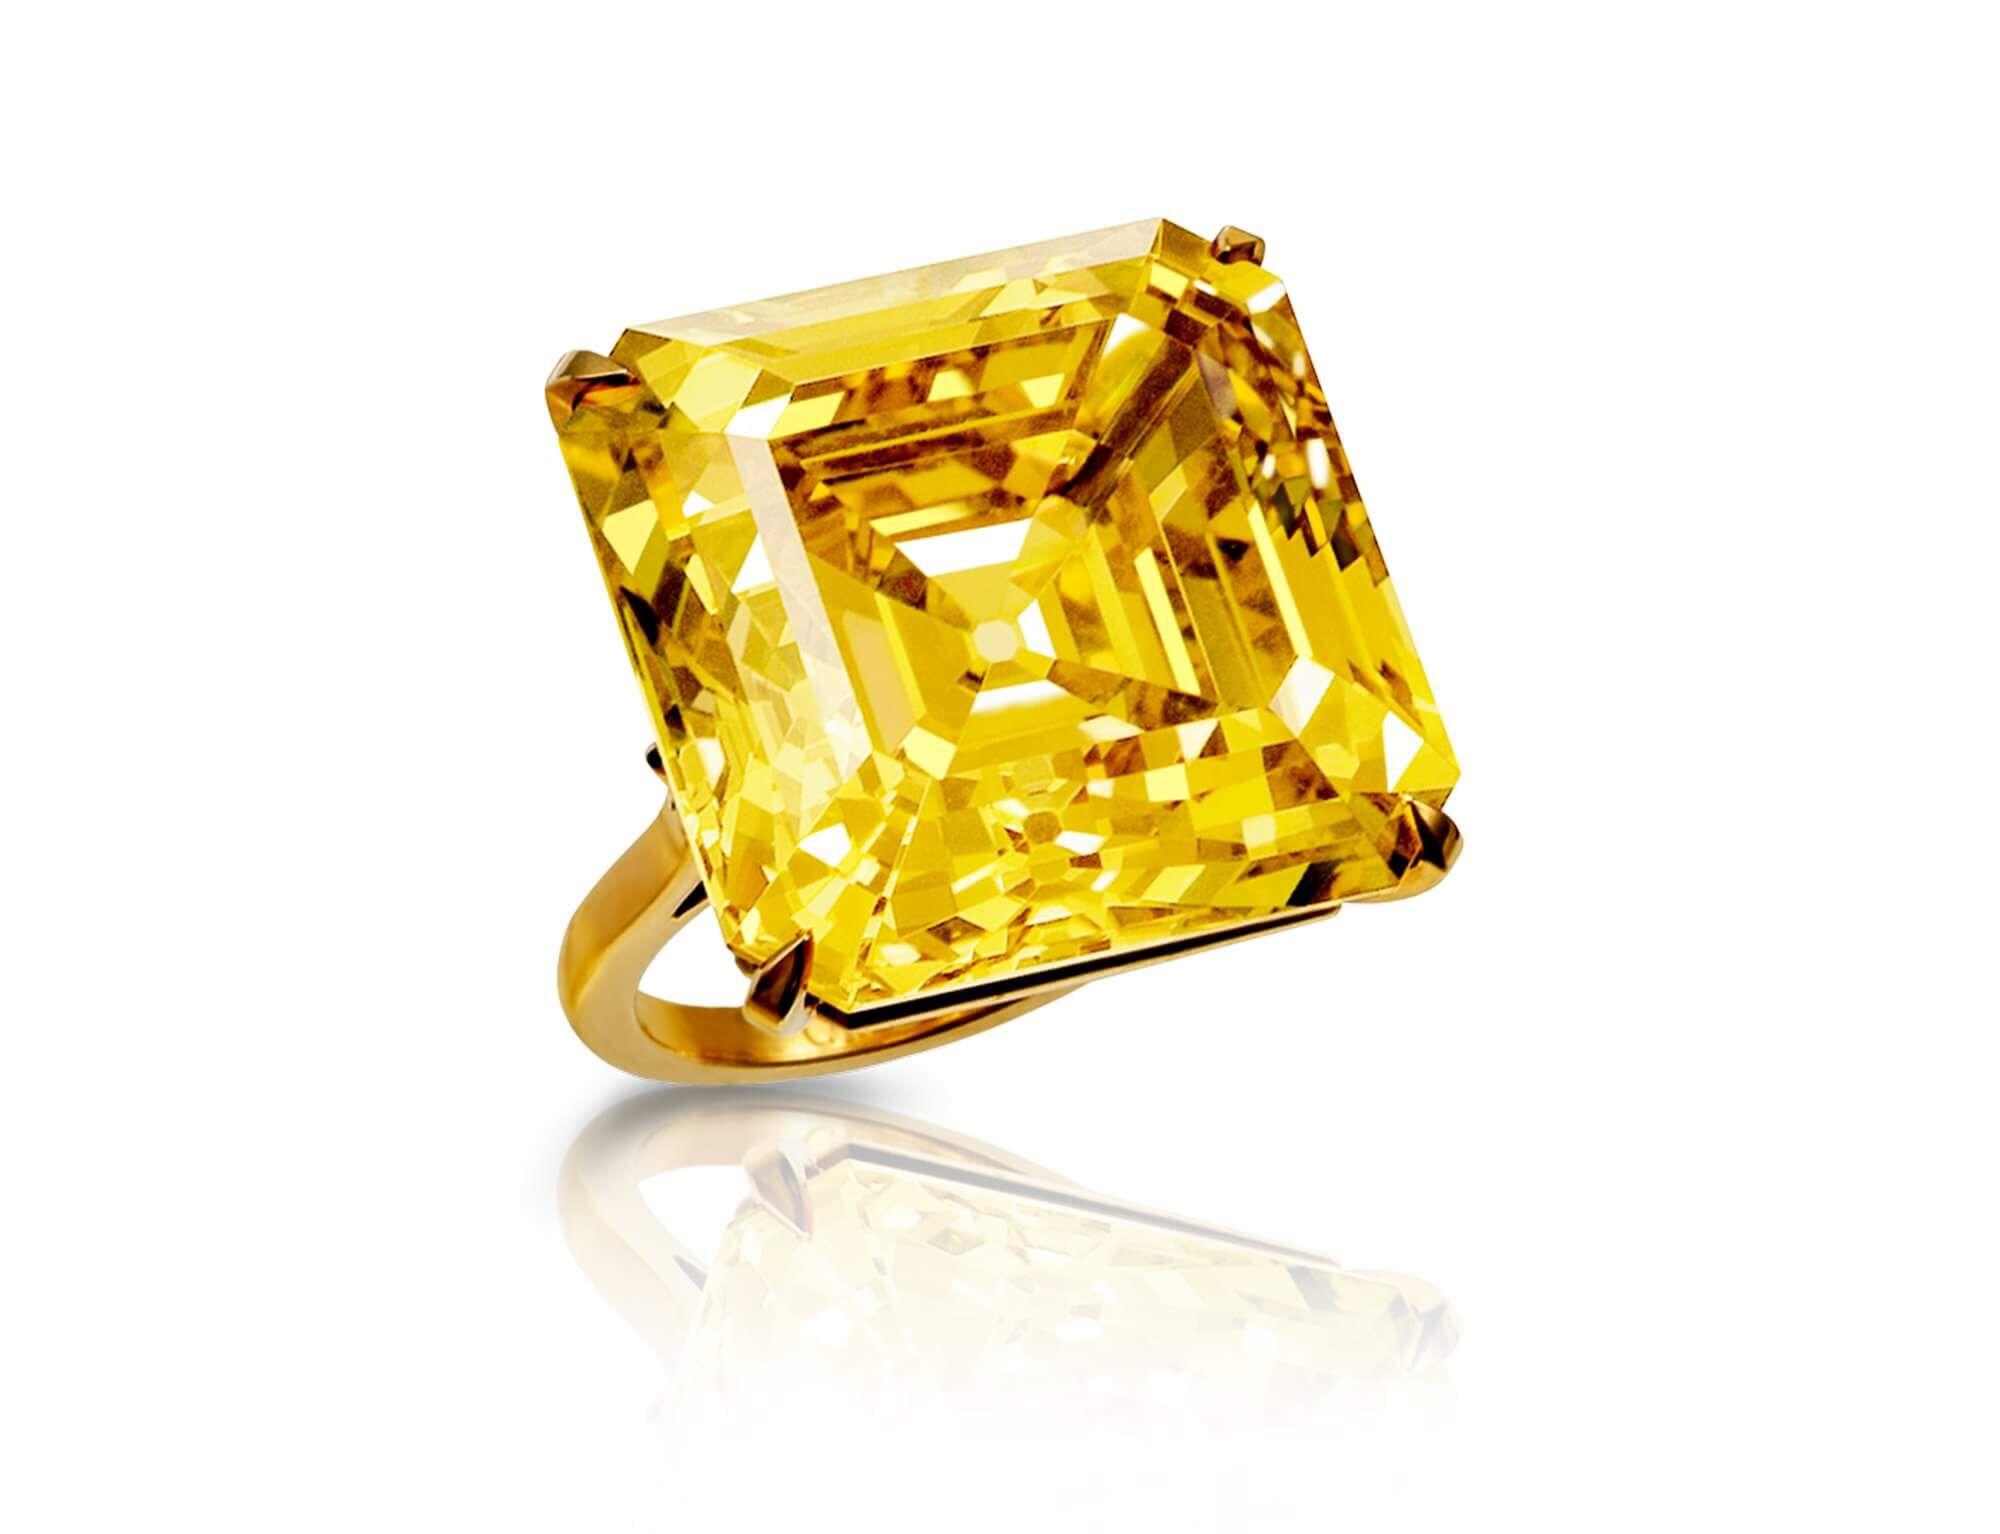 The Graff Star of Bombay- a emerald cut yellow diamond ring